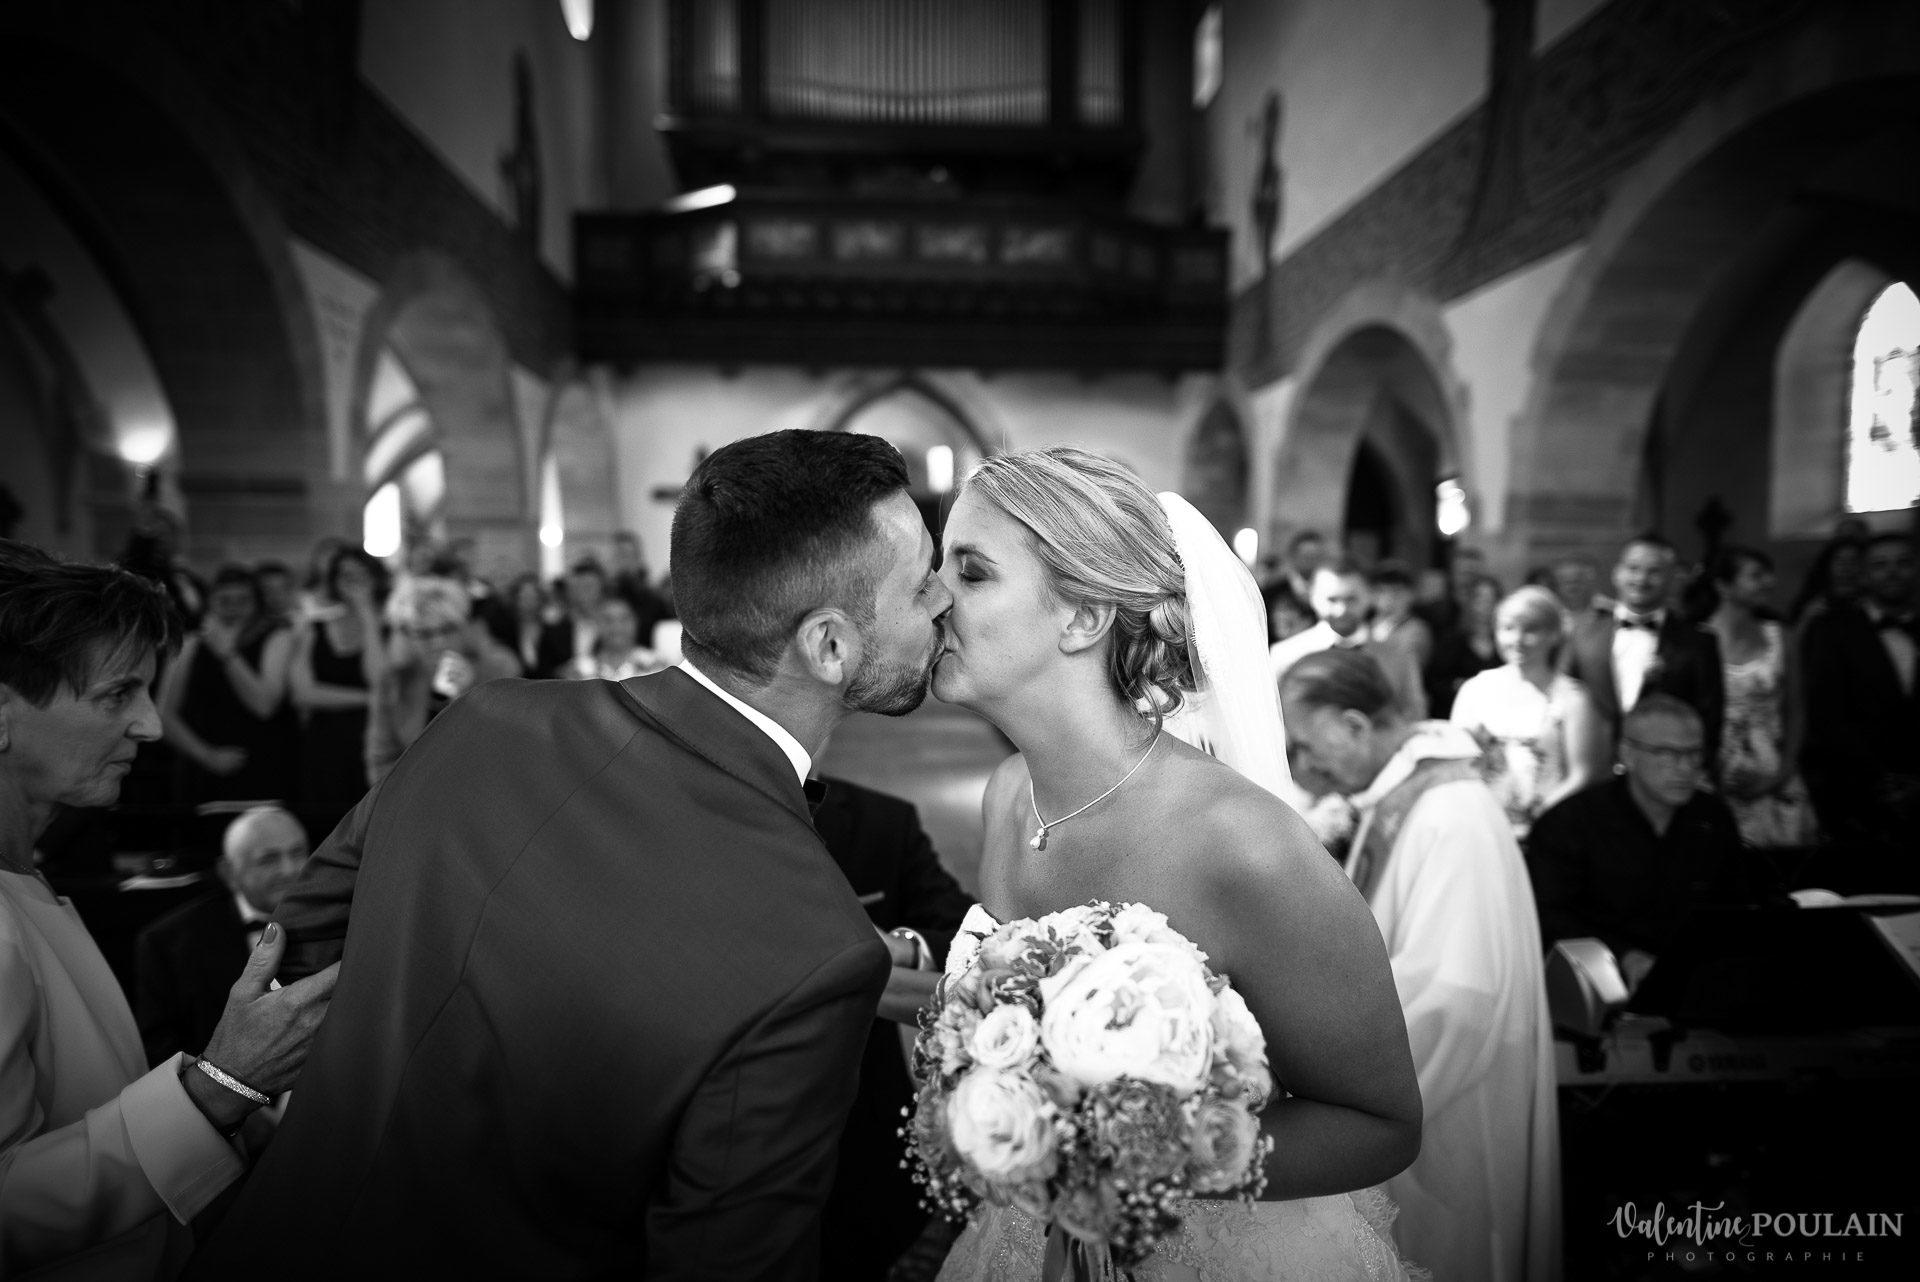 Mariage fun Petit Wettolsheim - Valentine Poulain noir et blanc